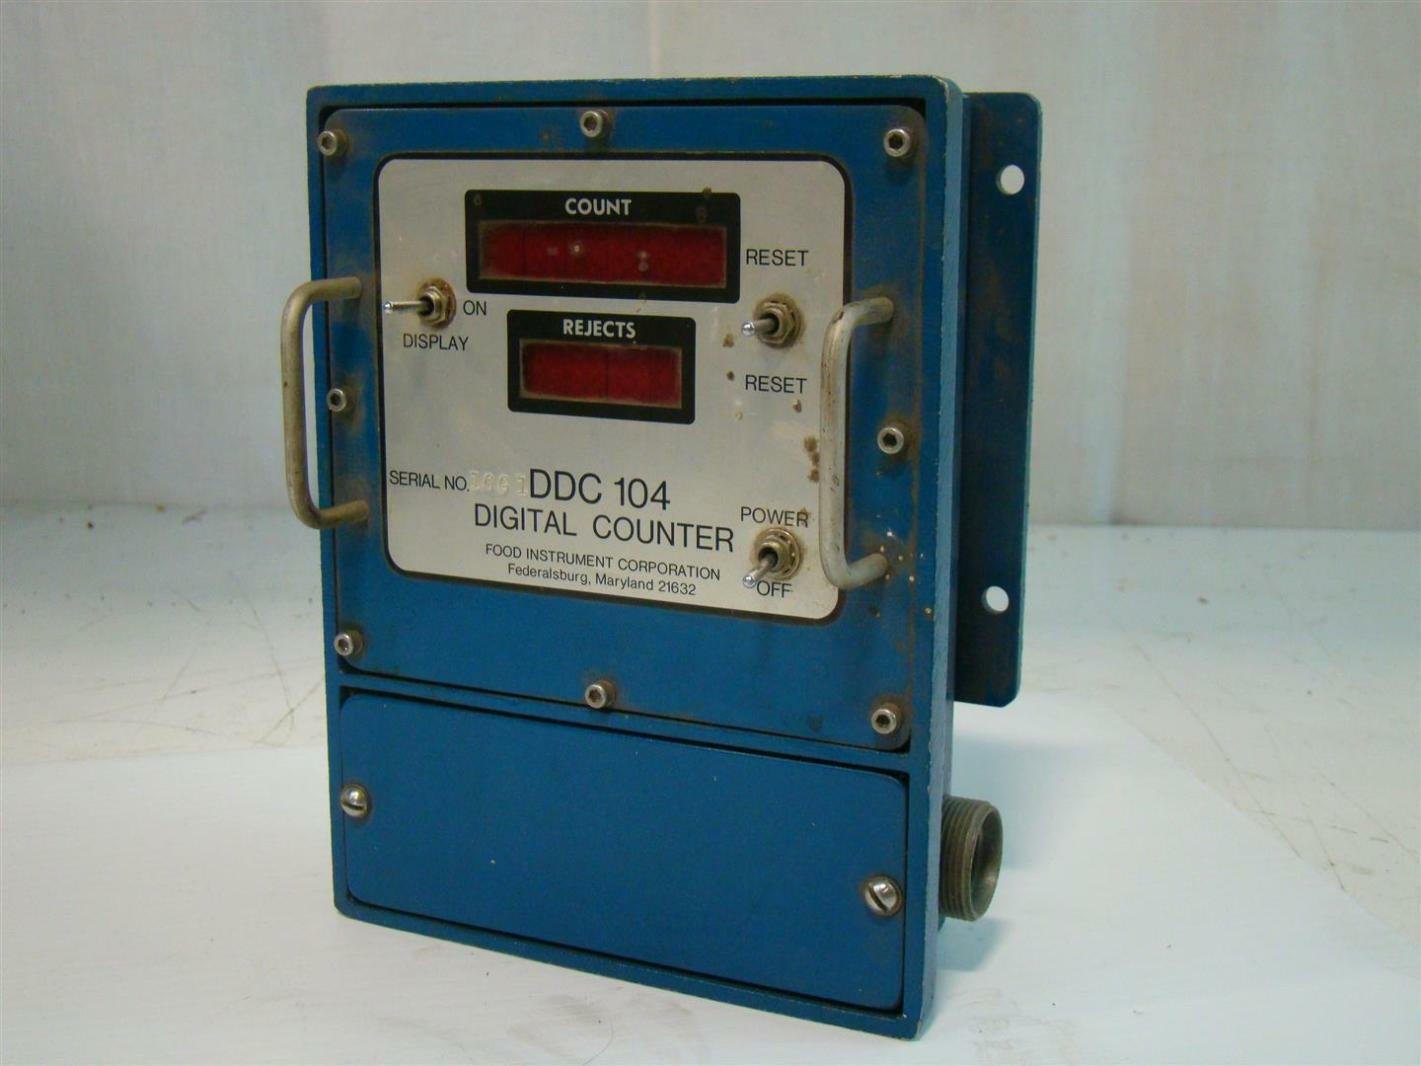 Food instrument corporation digital counter 10g1 ddc104 for Cuisine instrument